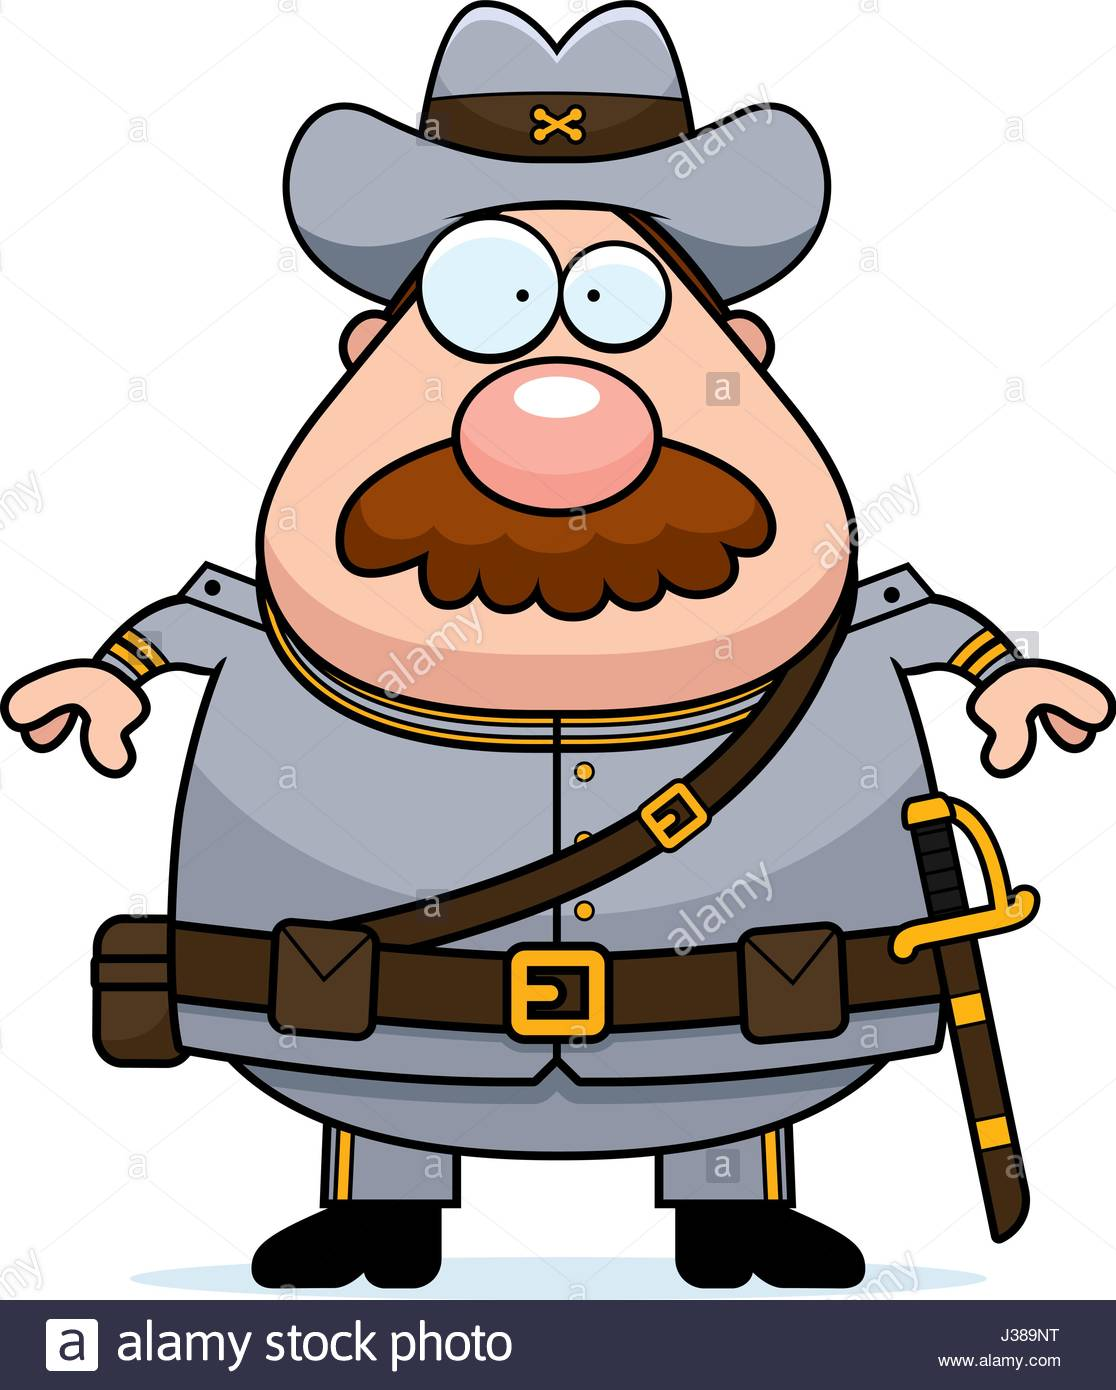 1116x1390 Cartoon Illustration Of Civil War Confederate Soldier